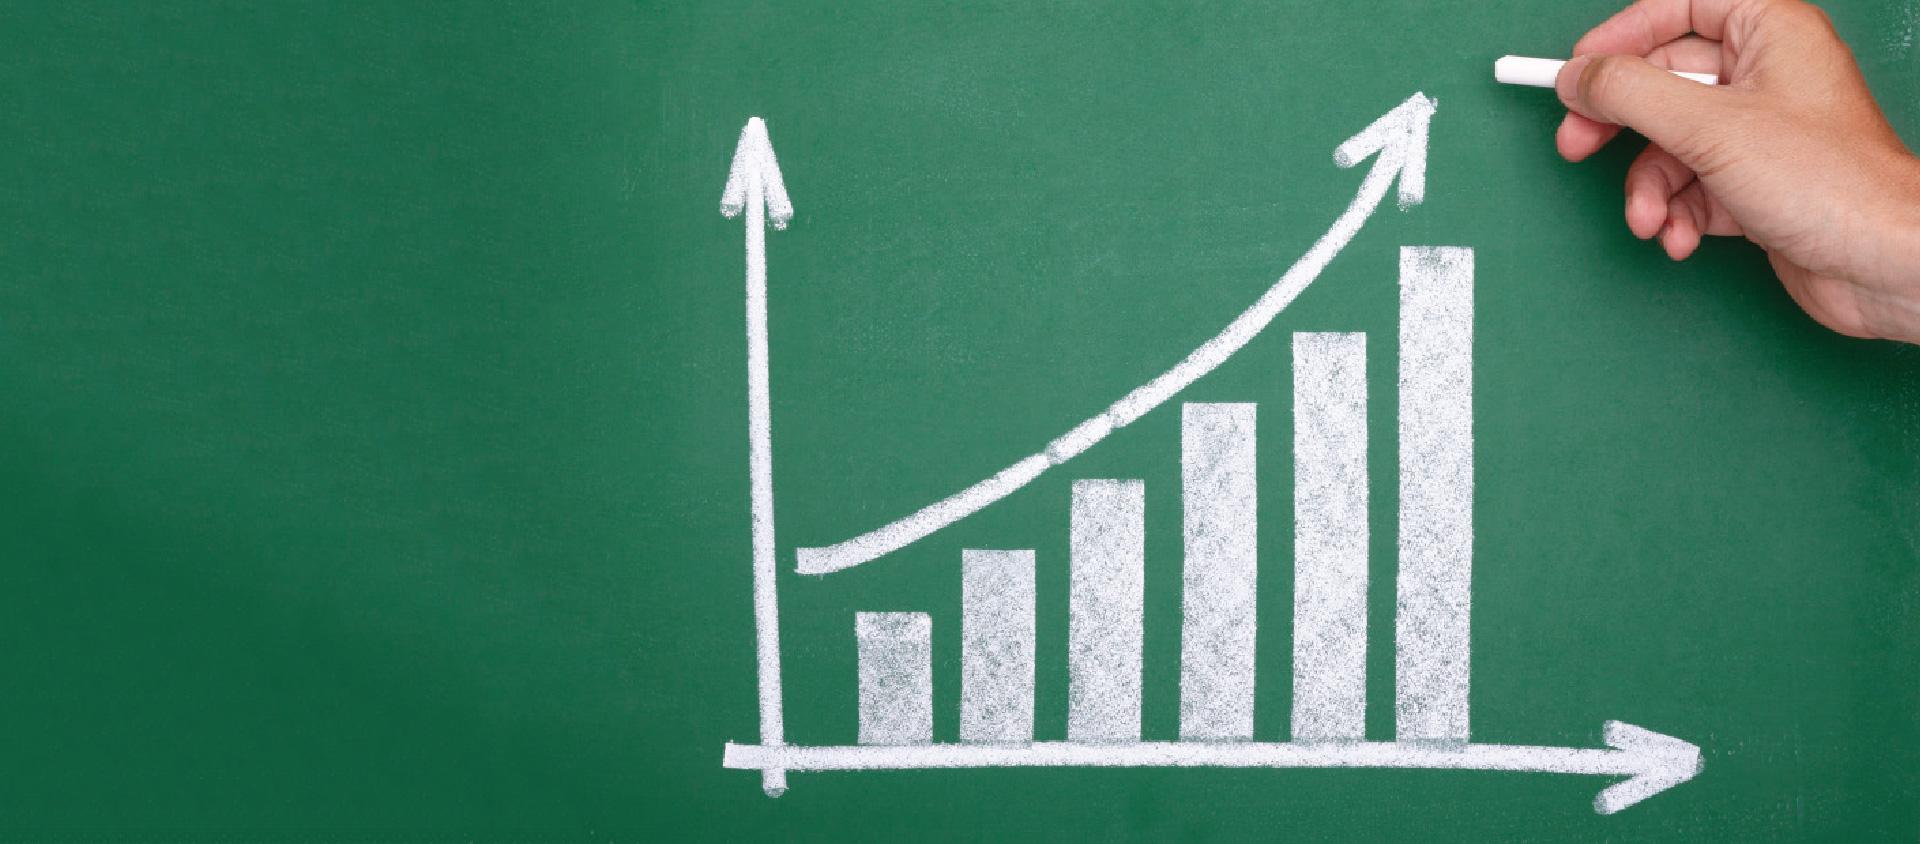 Cresce o número de beneficiários dos planos de saúde